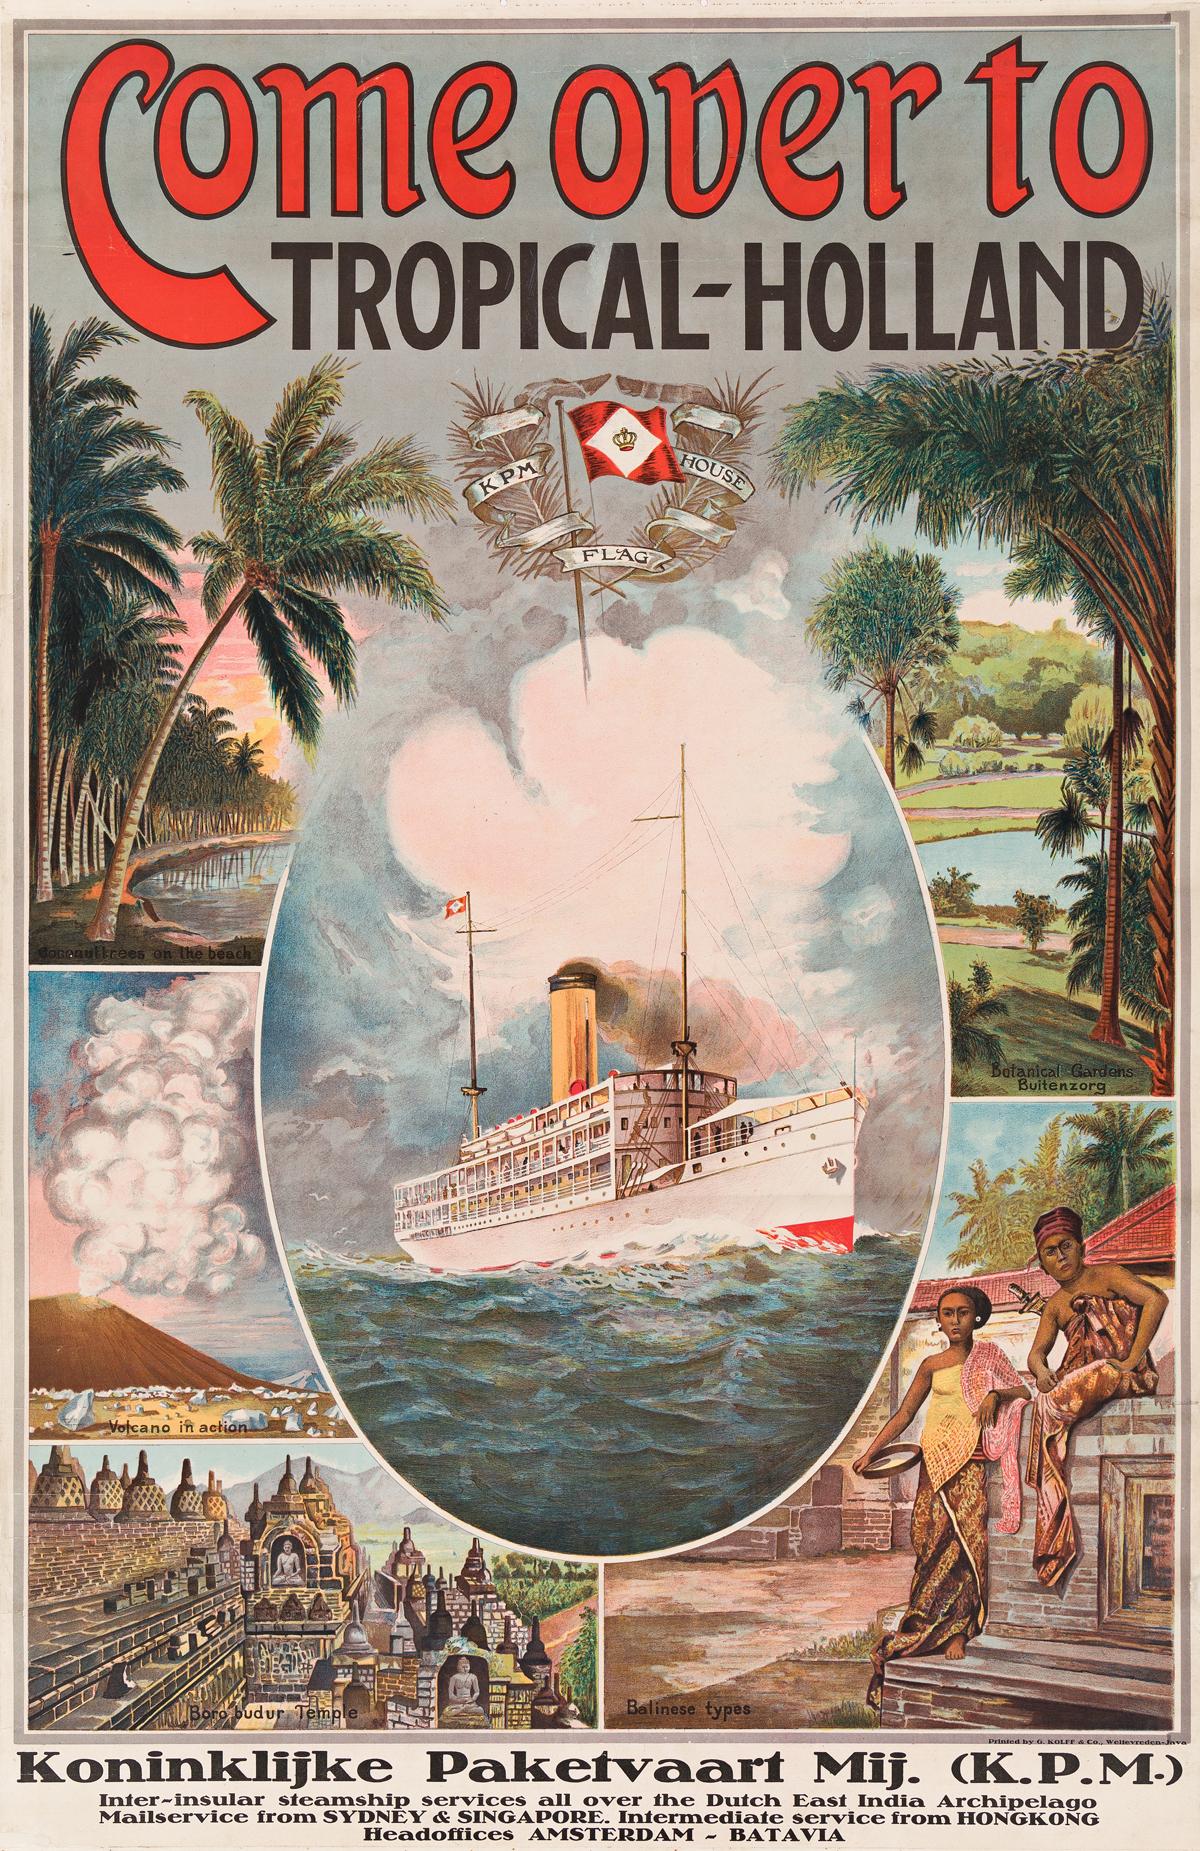 Designer Unknown.   COME OVER TO TROPICAL- HOLLAND / K.P.M.  Circa 1913.